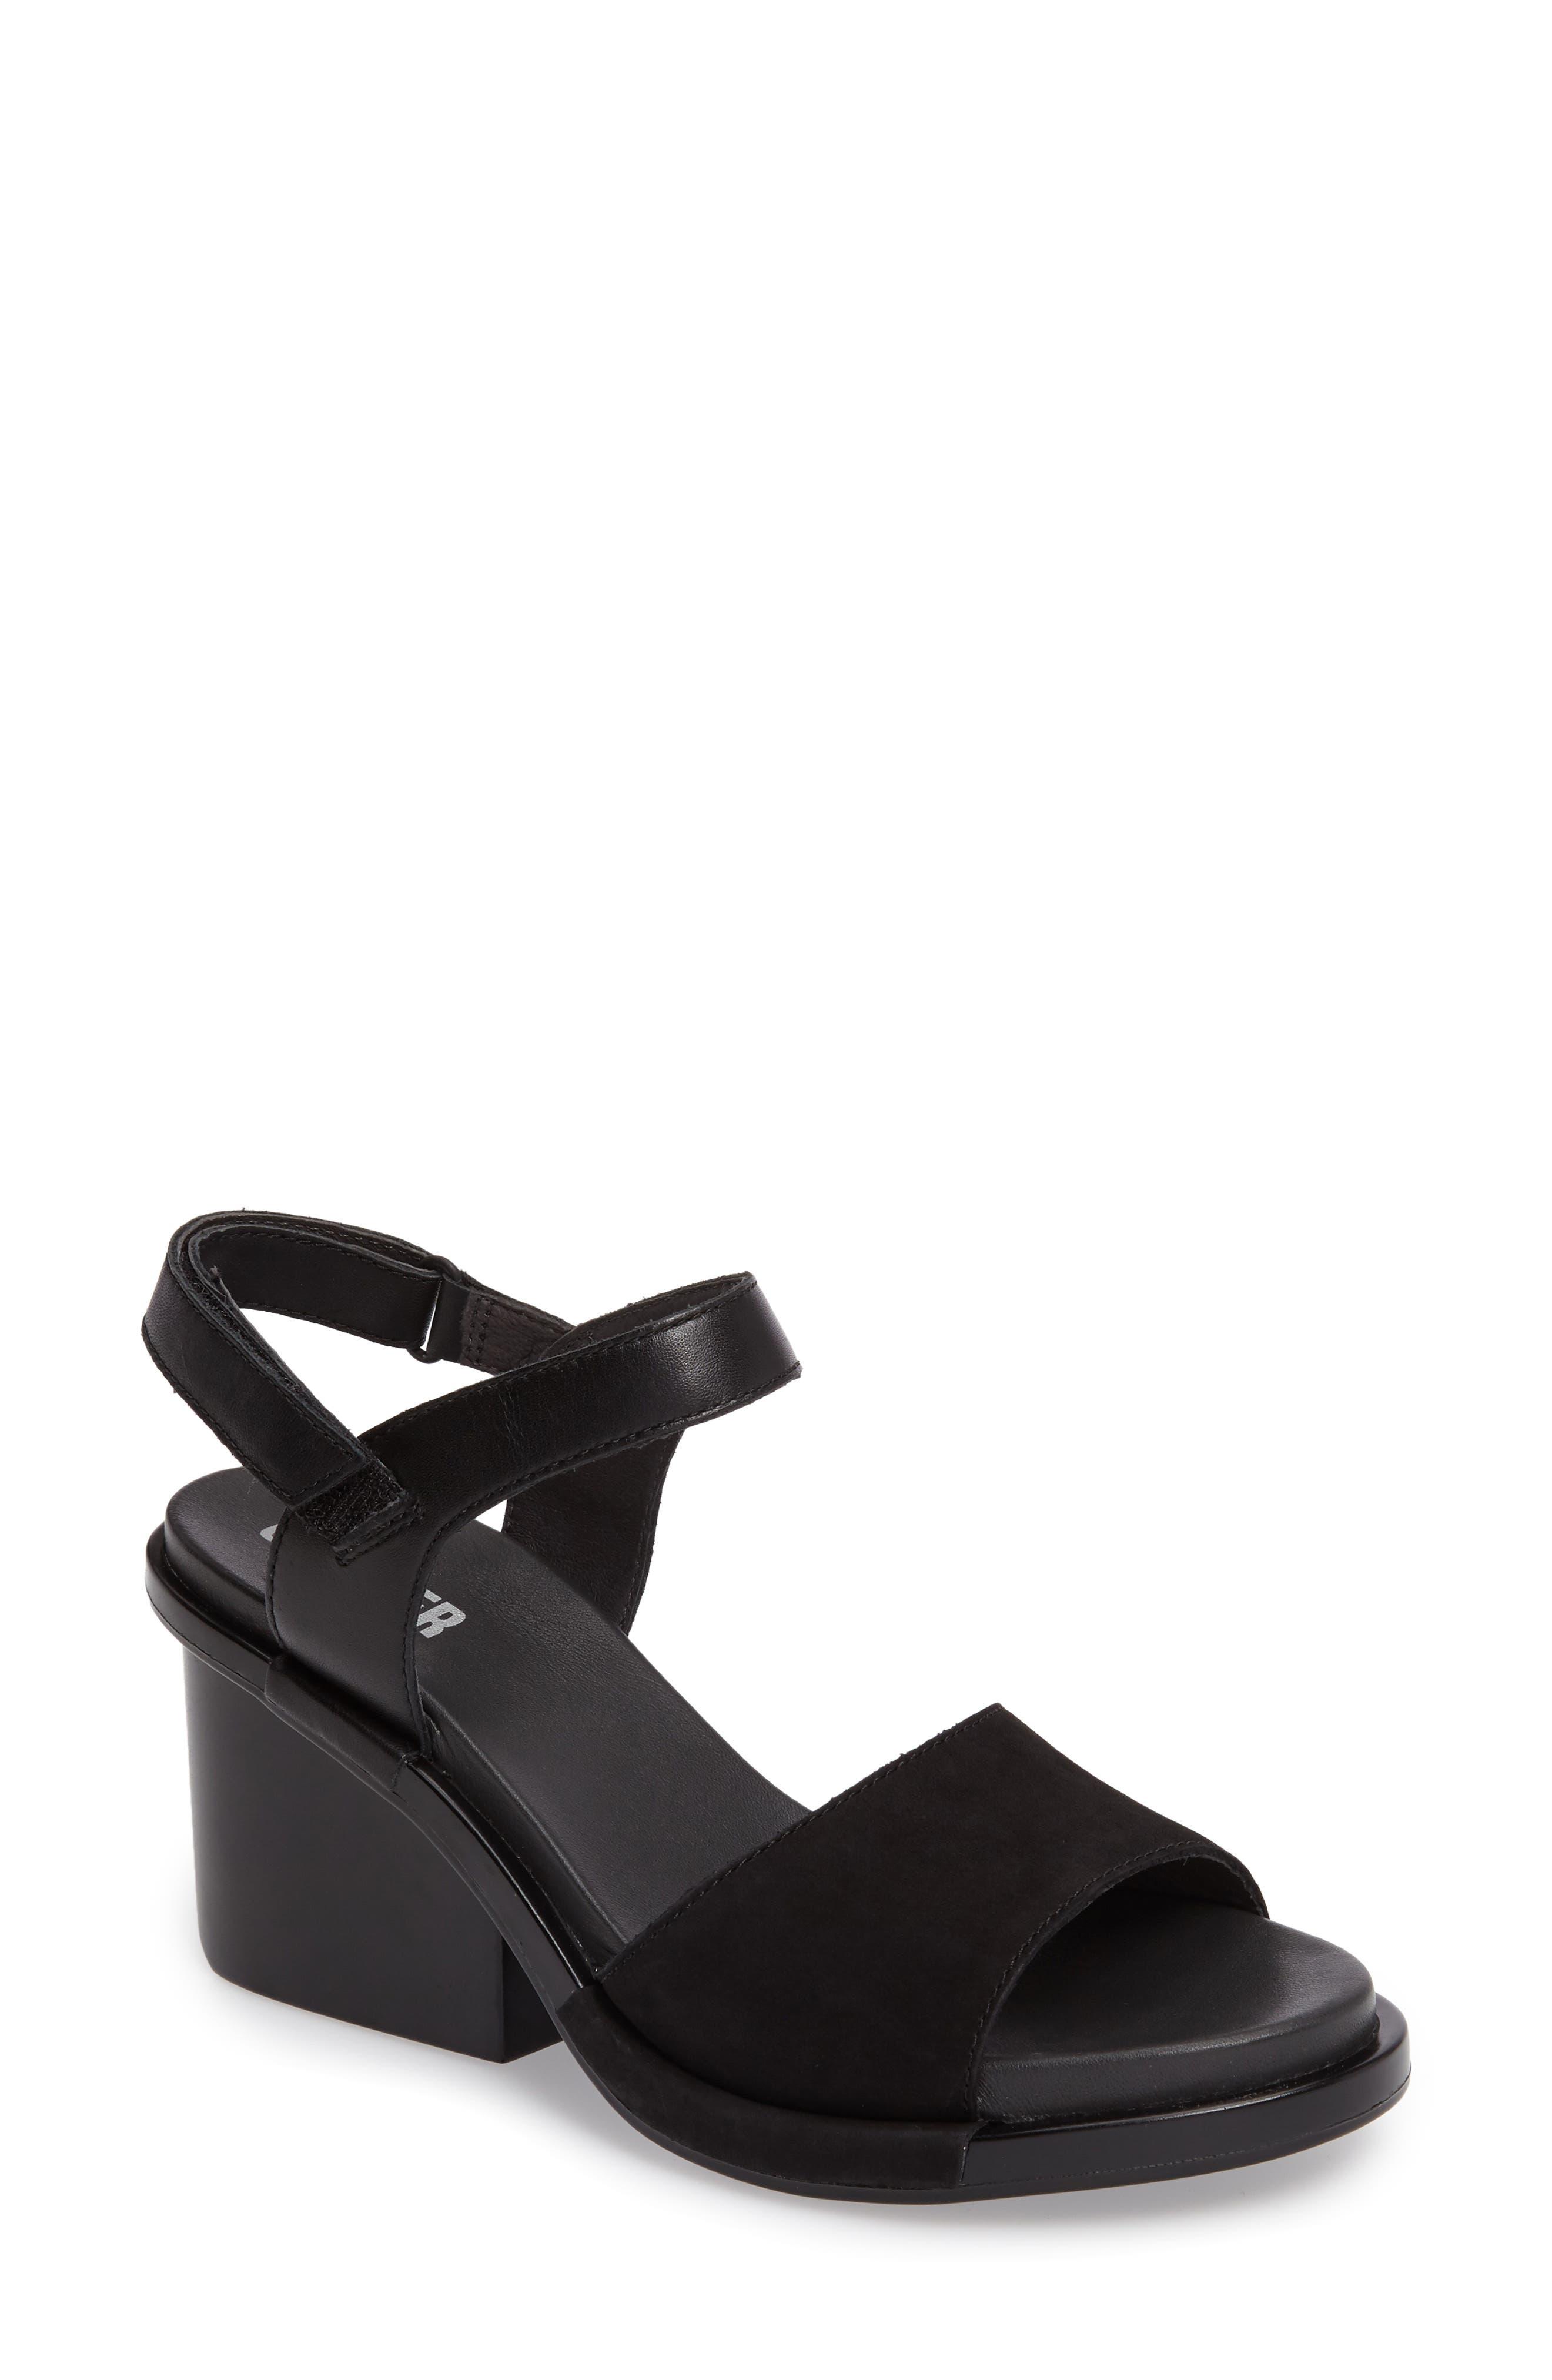 Ivy Ankle Strap Sandal,                         Main,                         color, Black Leather